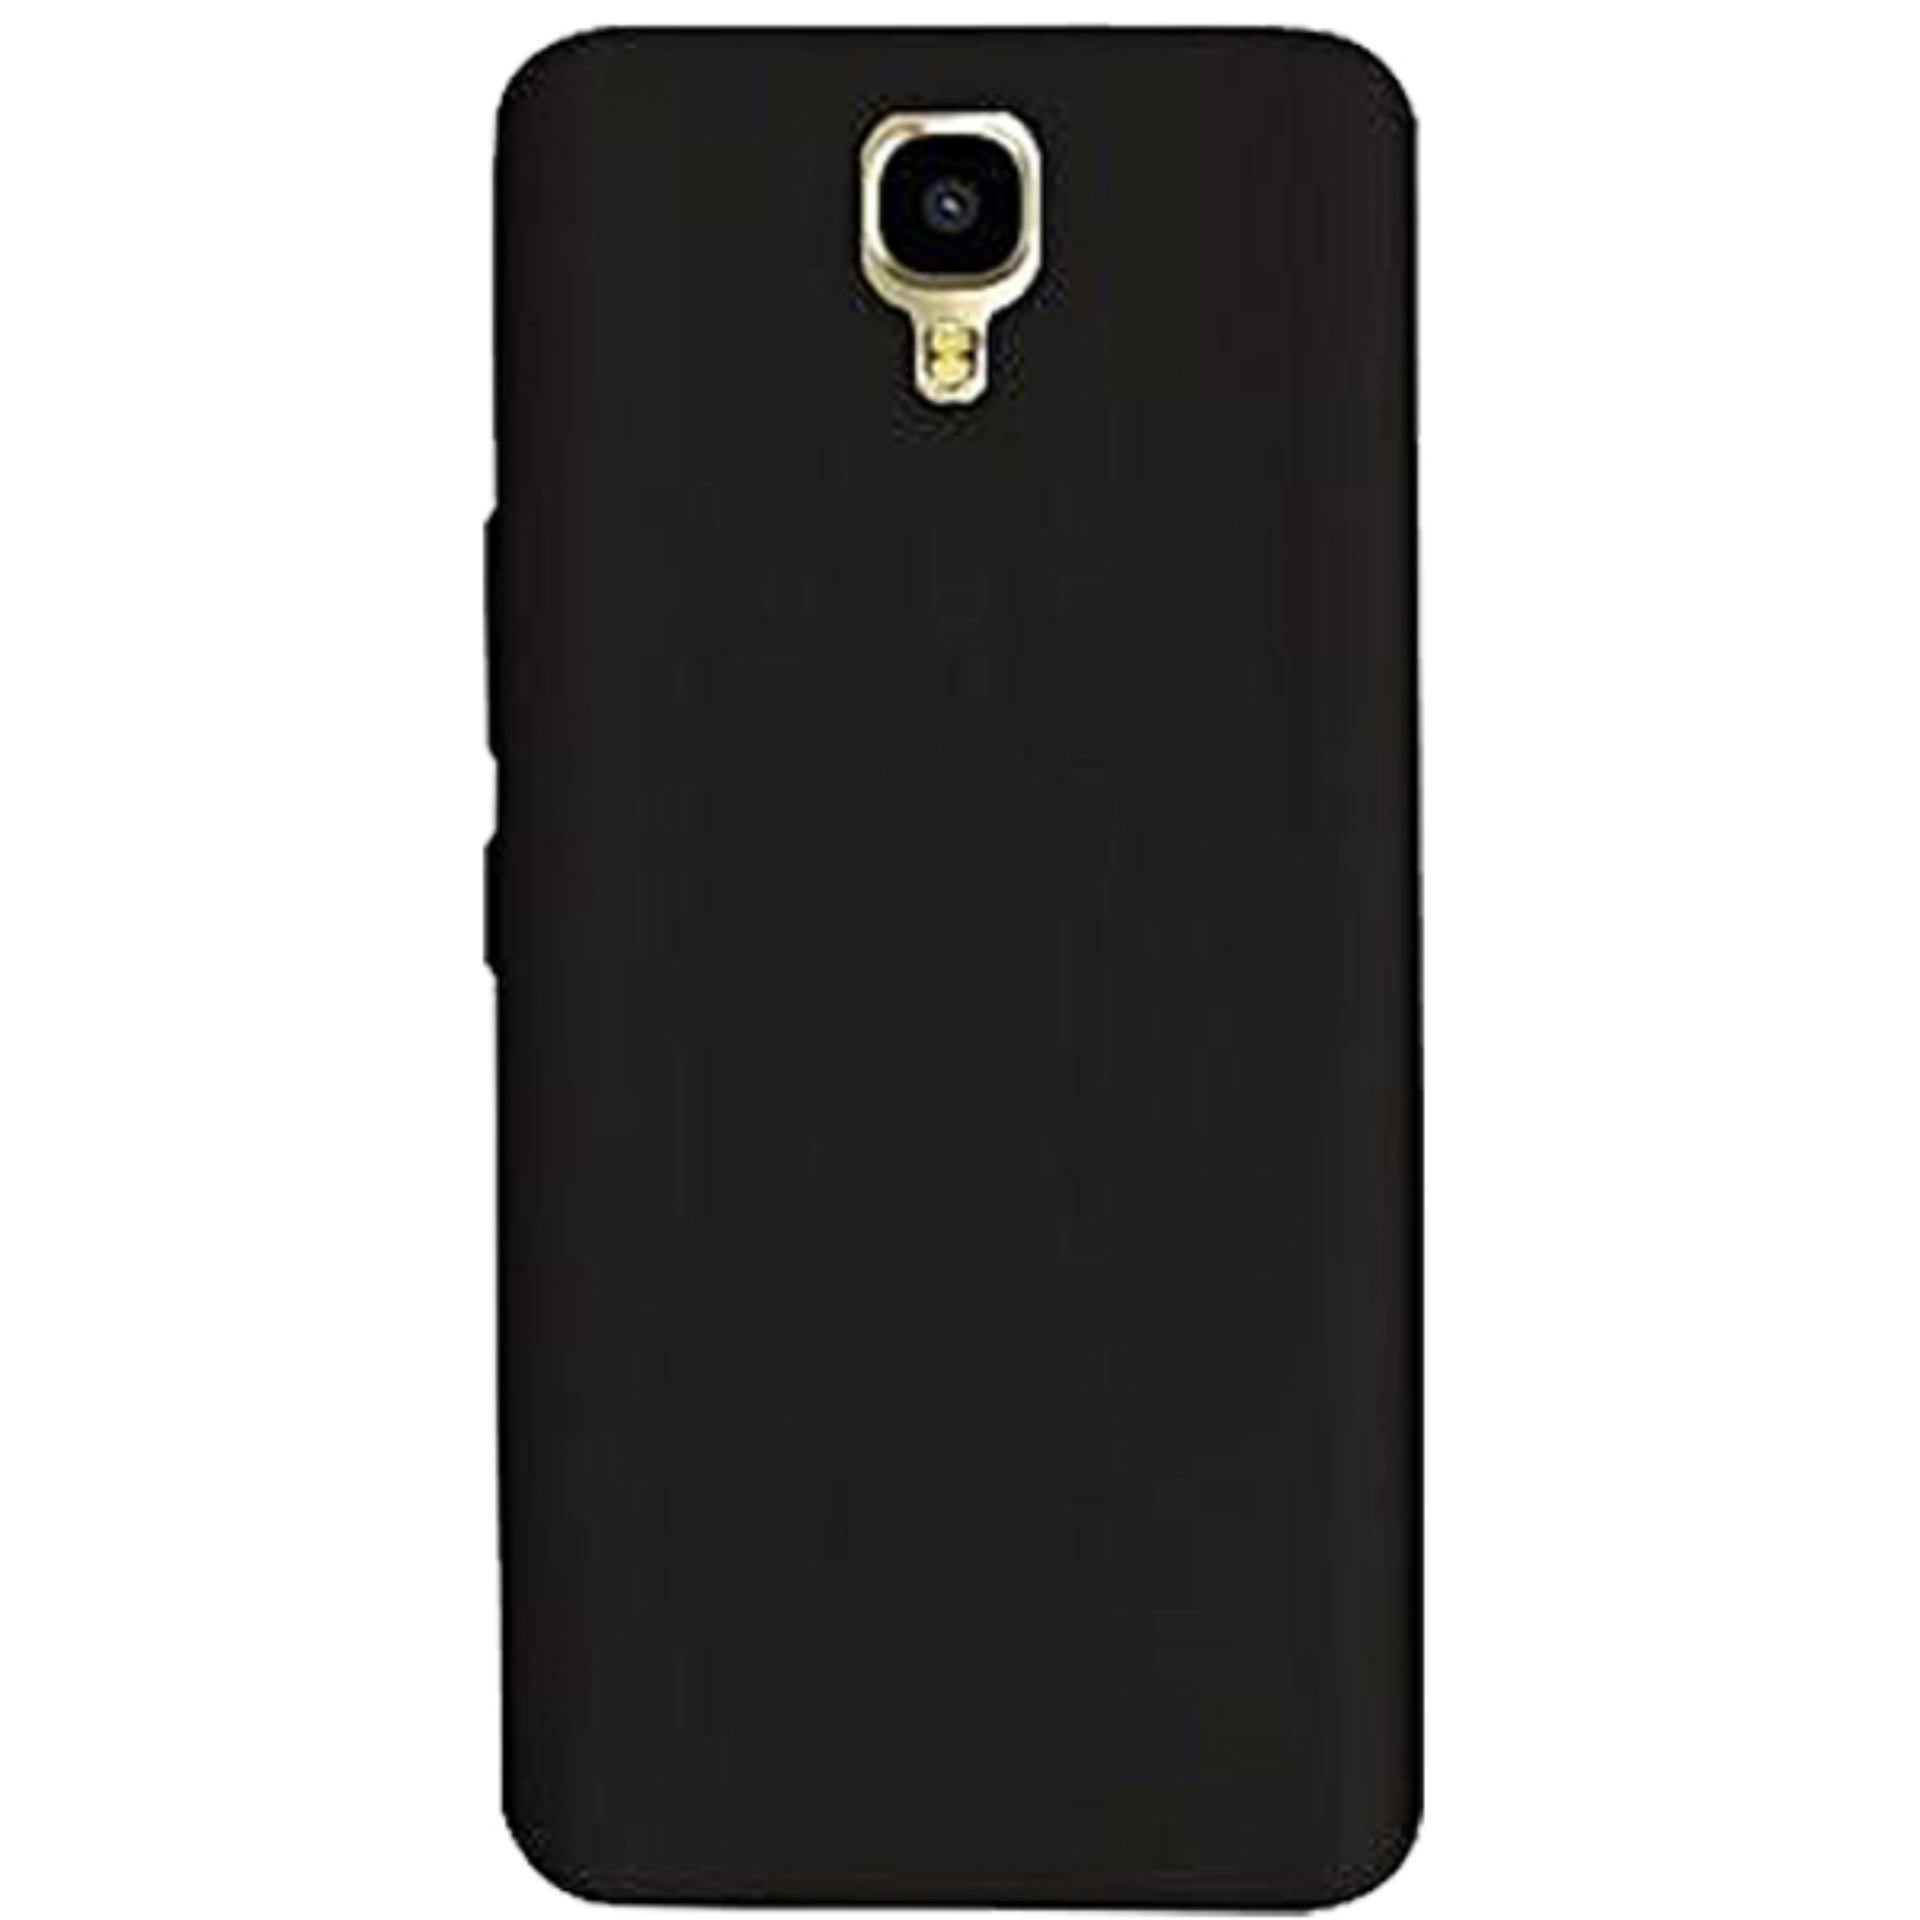 Case Slim Black doff Matte Anti minyak For Infinix Note 4 - X572 - Black Doff